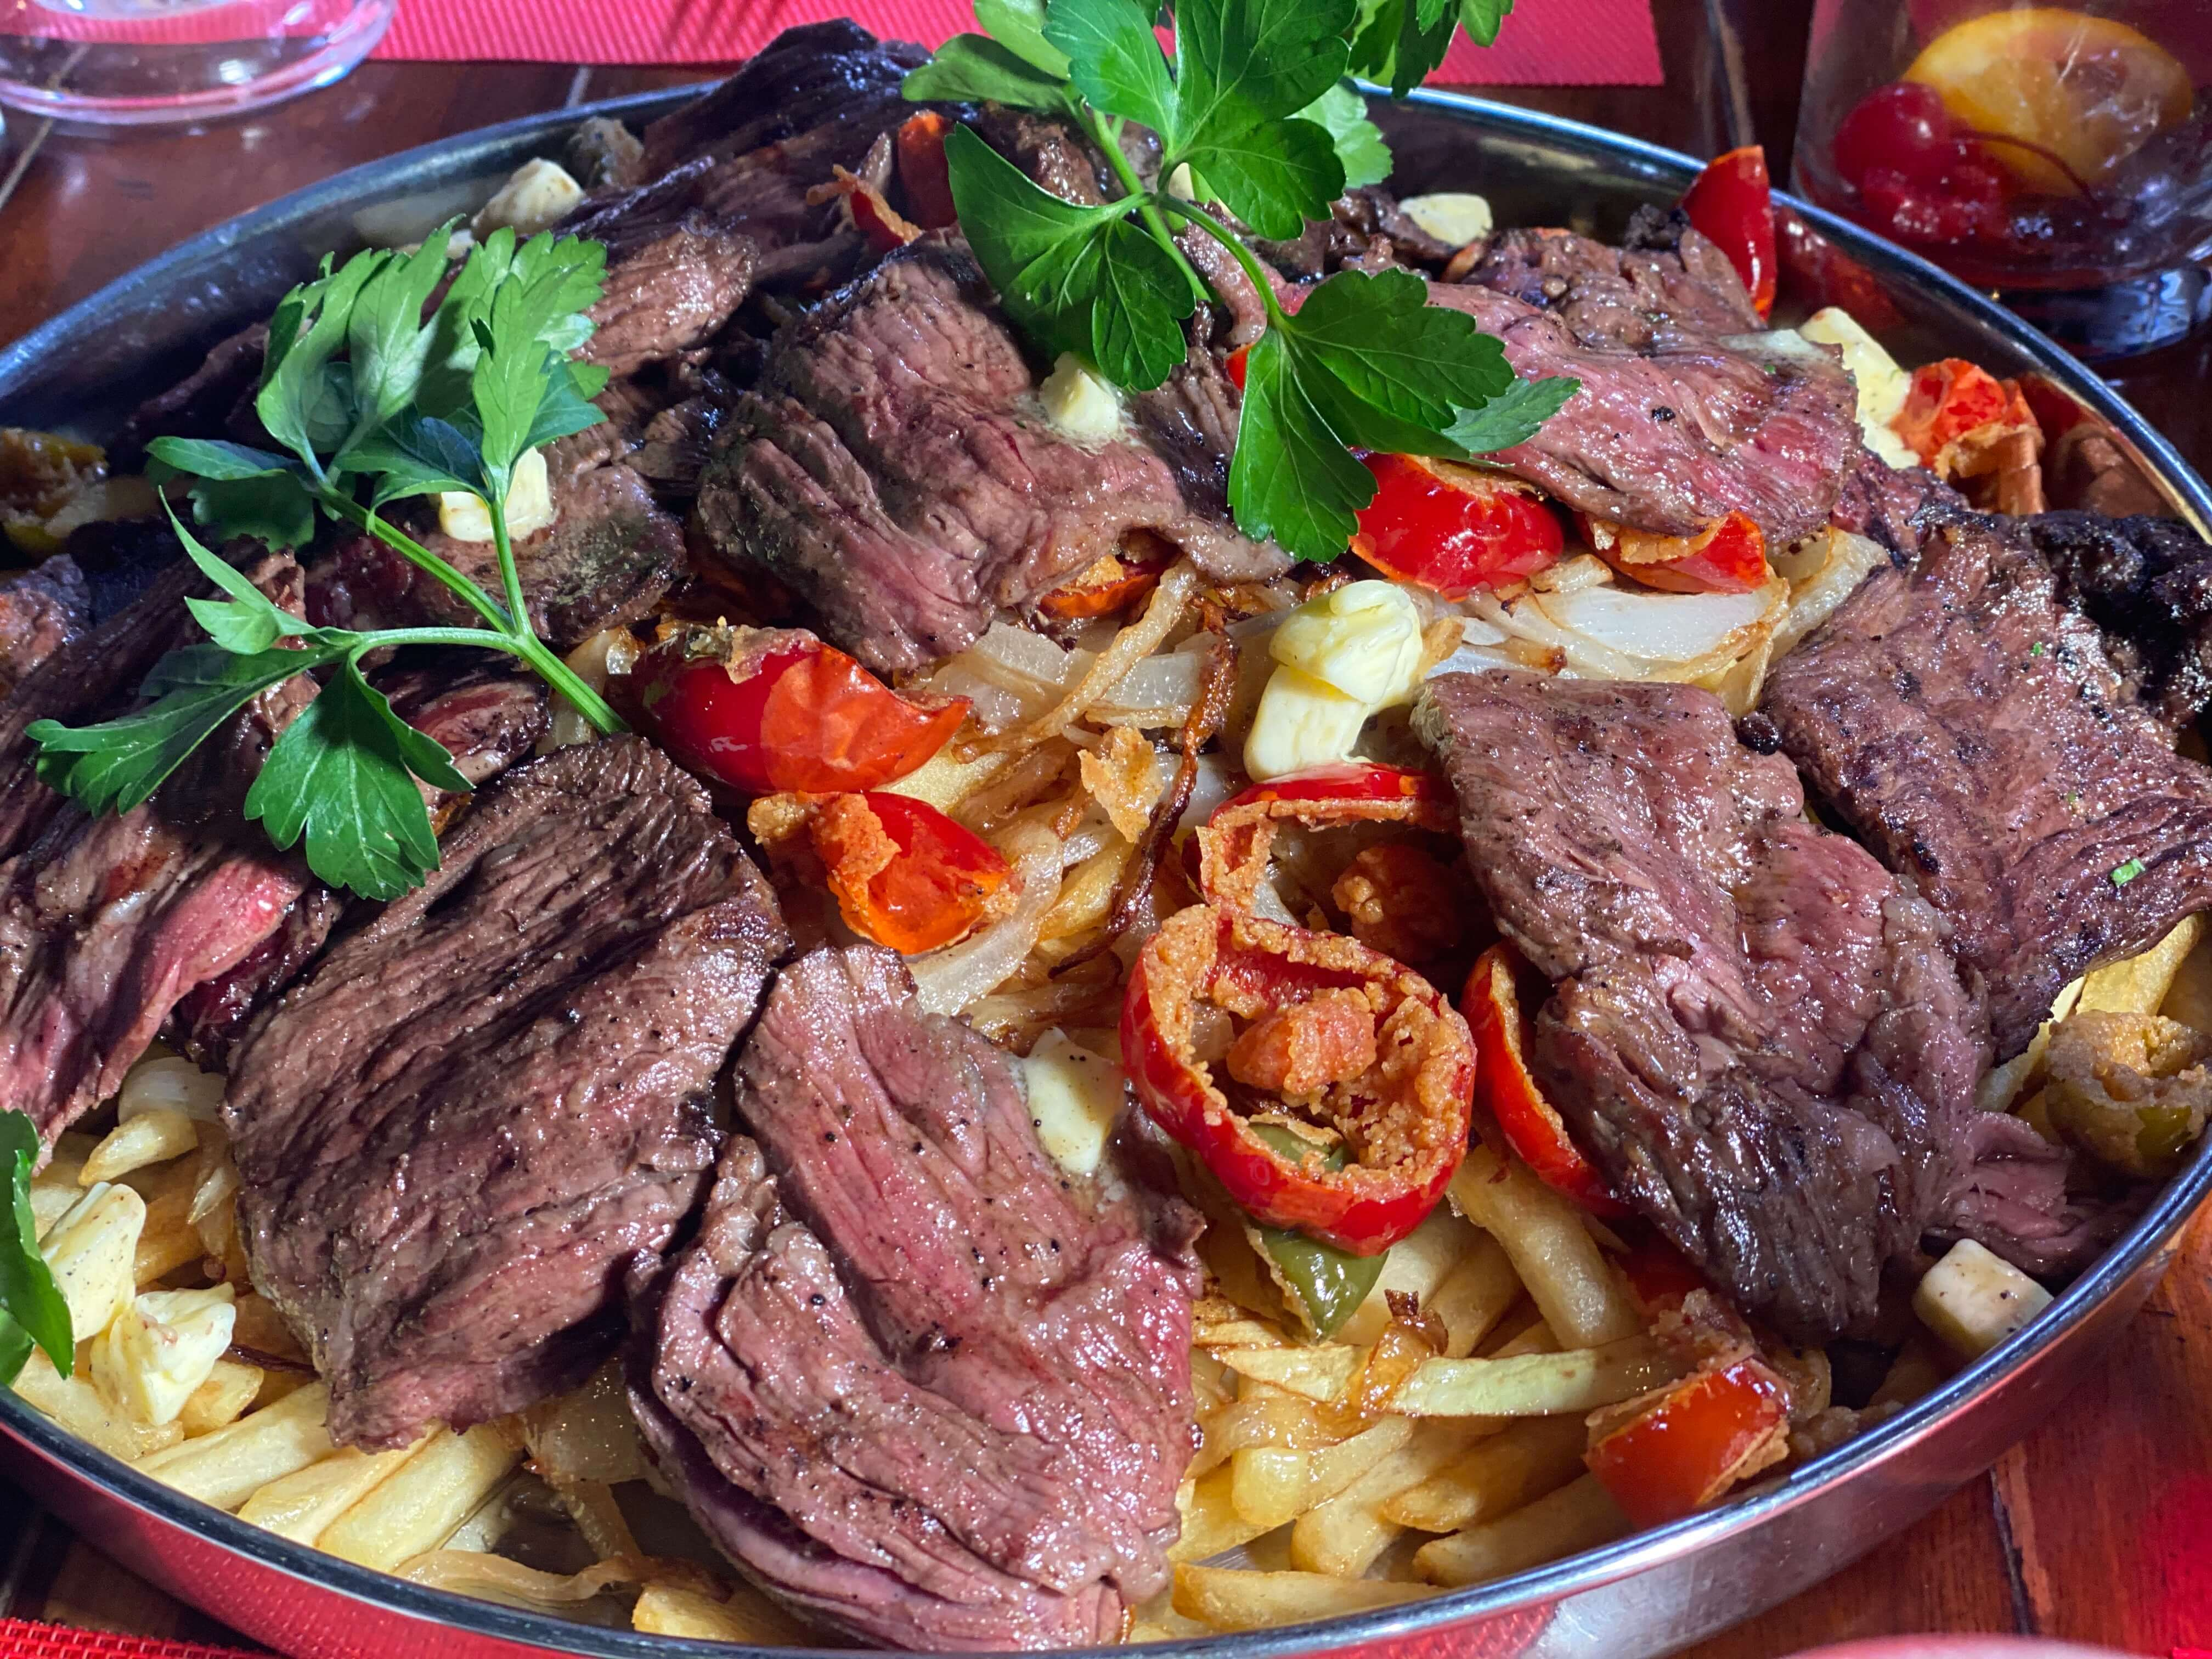 madonia stamford skirt steak